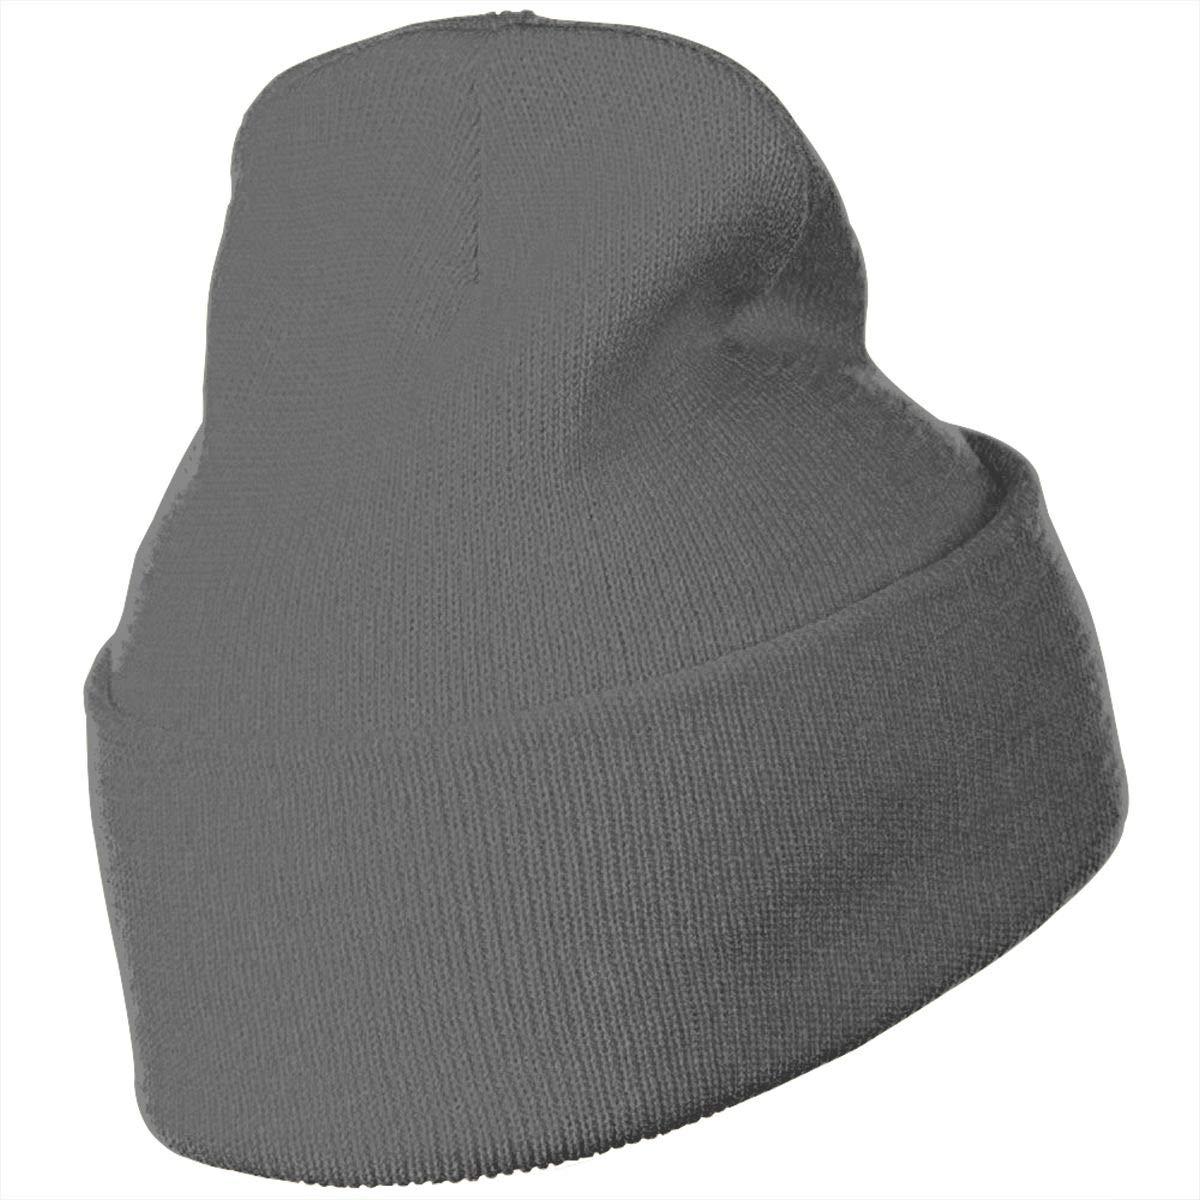 Valentines Day Romantic Art Unisex Fashion Knitted Hat Luxury Hip-Hop Cap